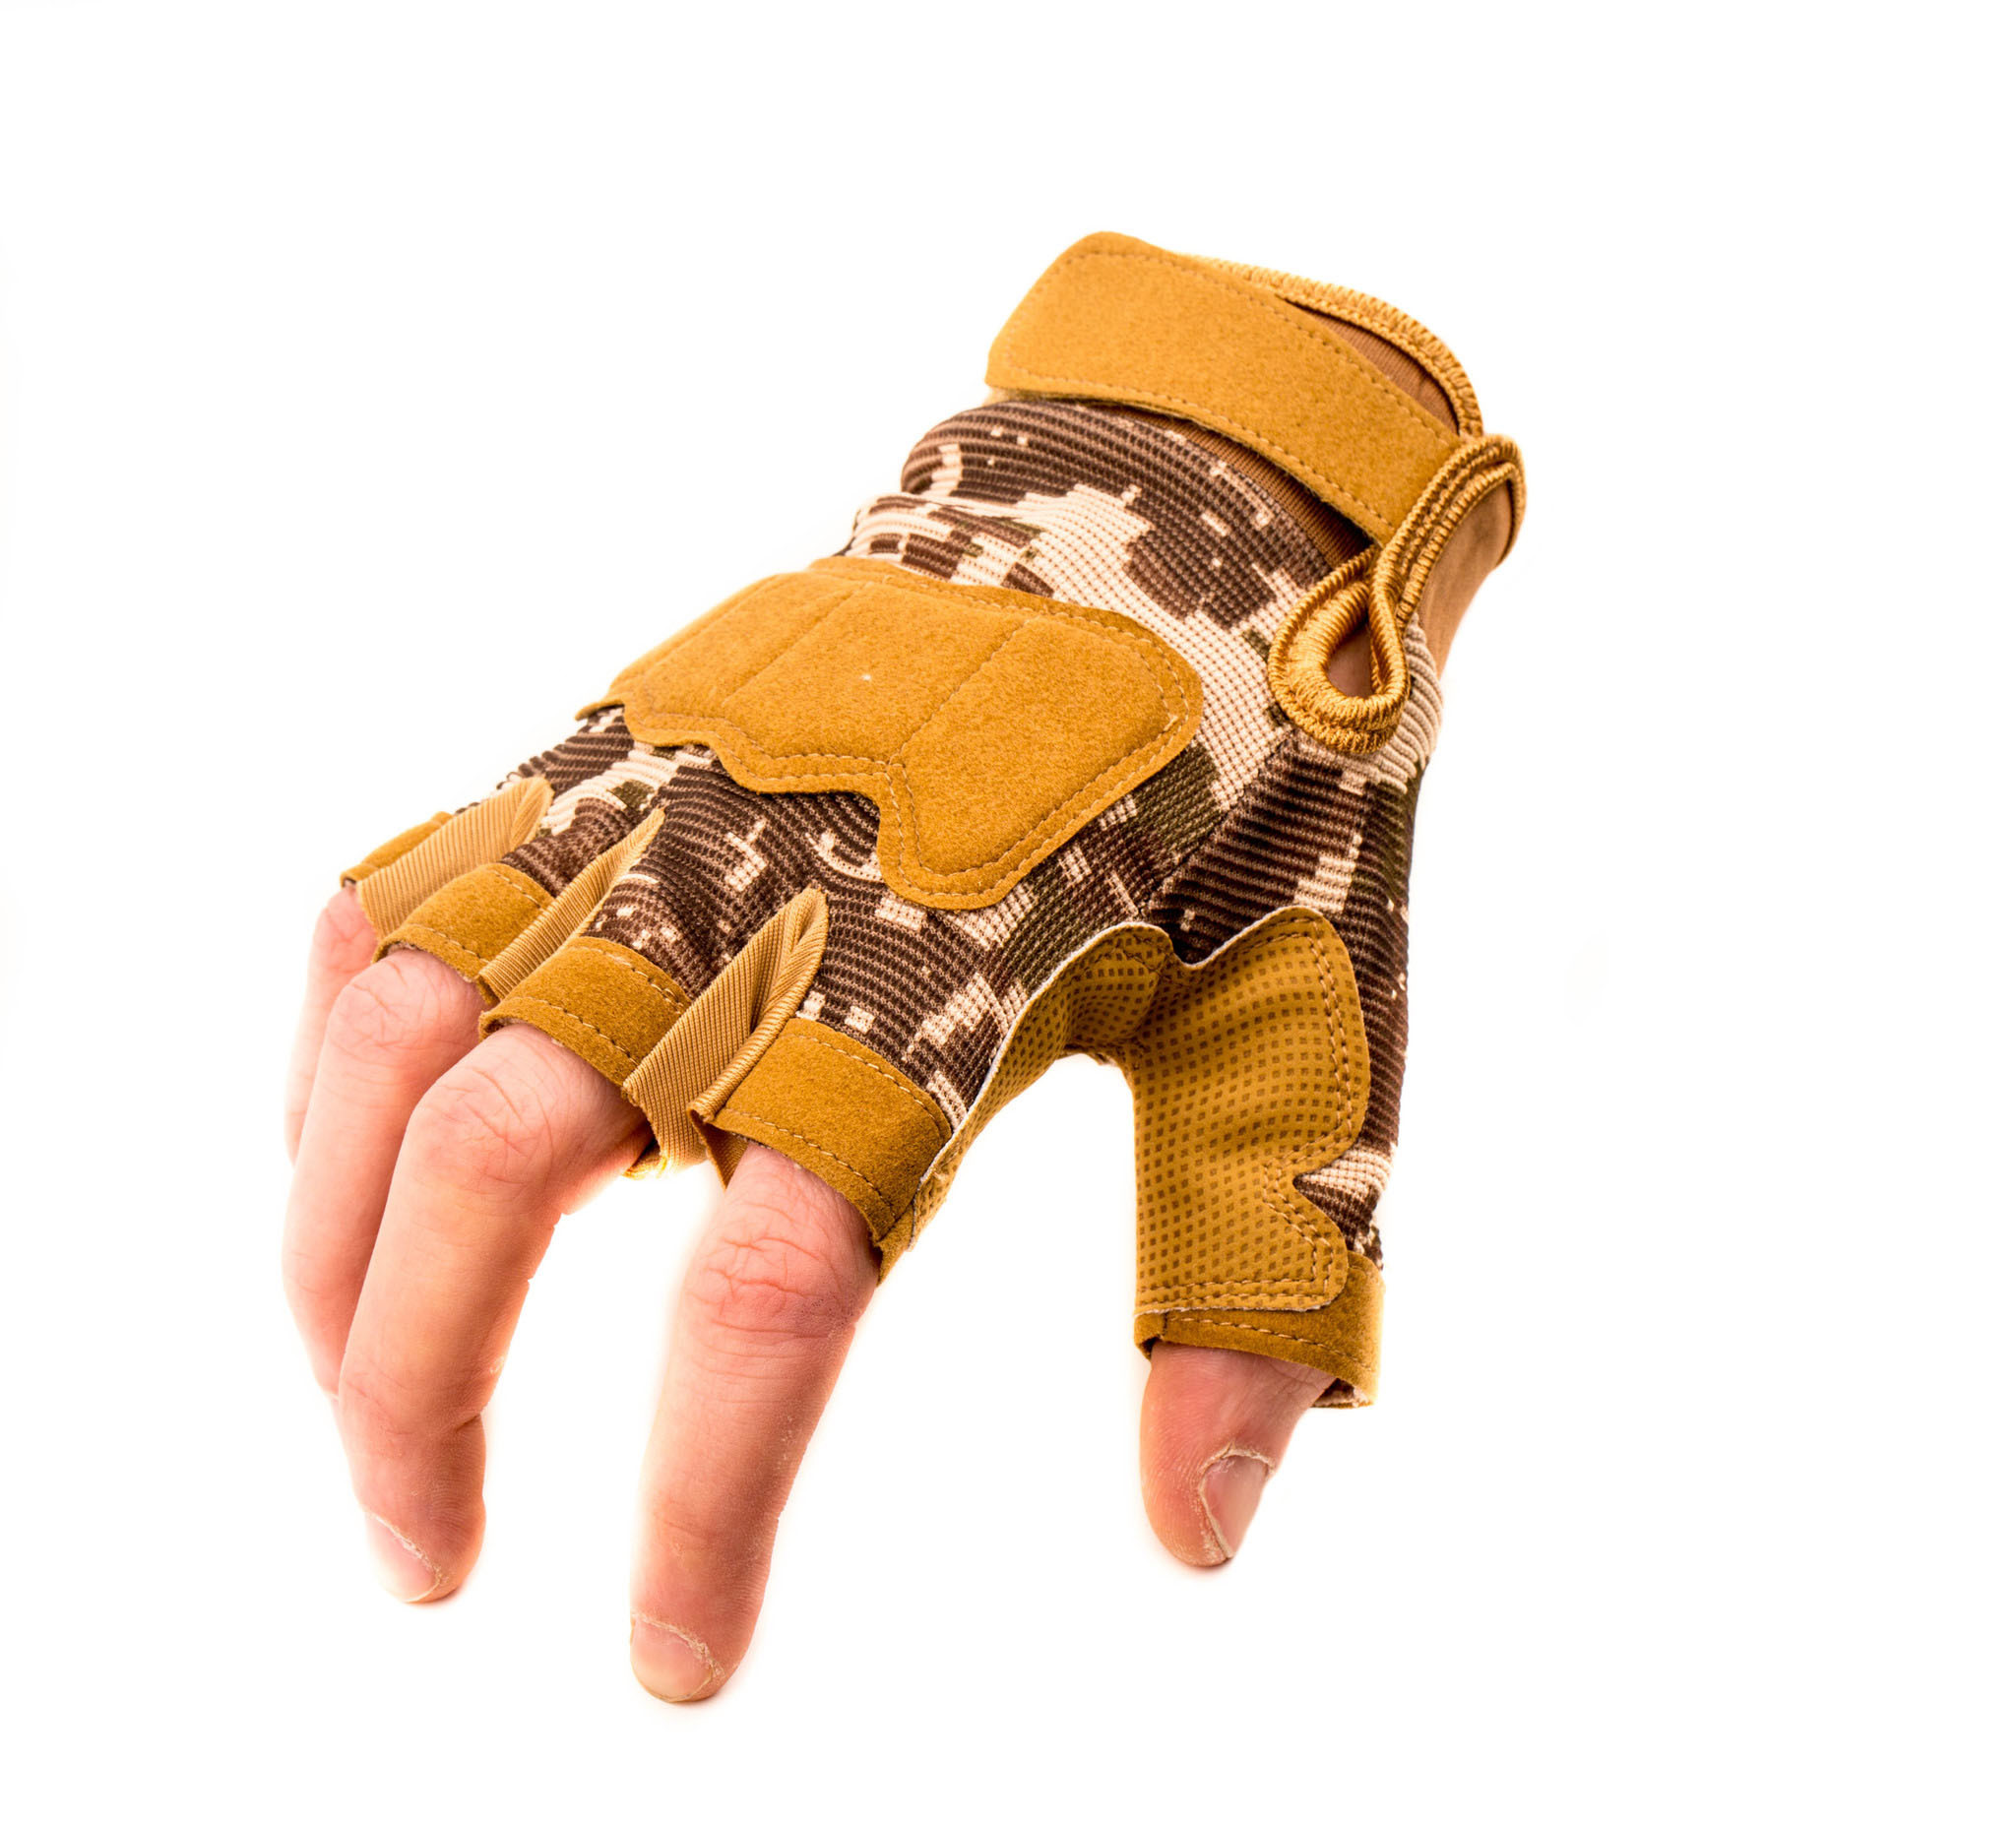 Тактические перчатки без пальцев Safari, размер L от China Factory